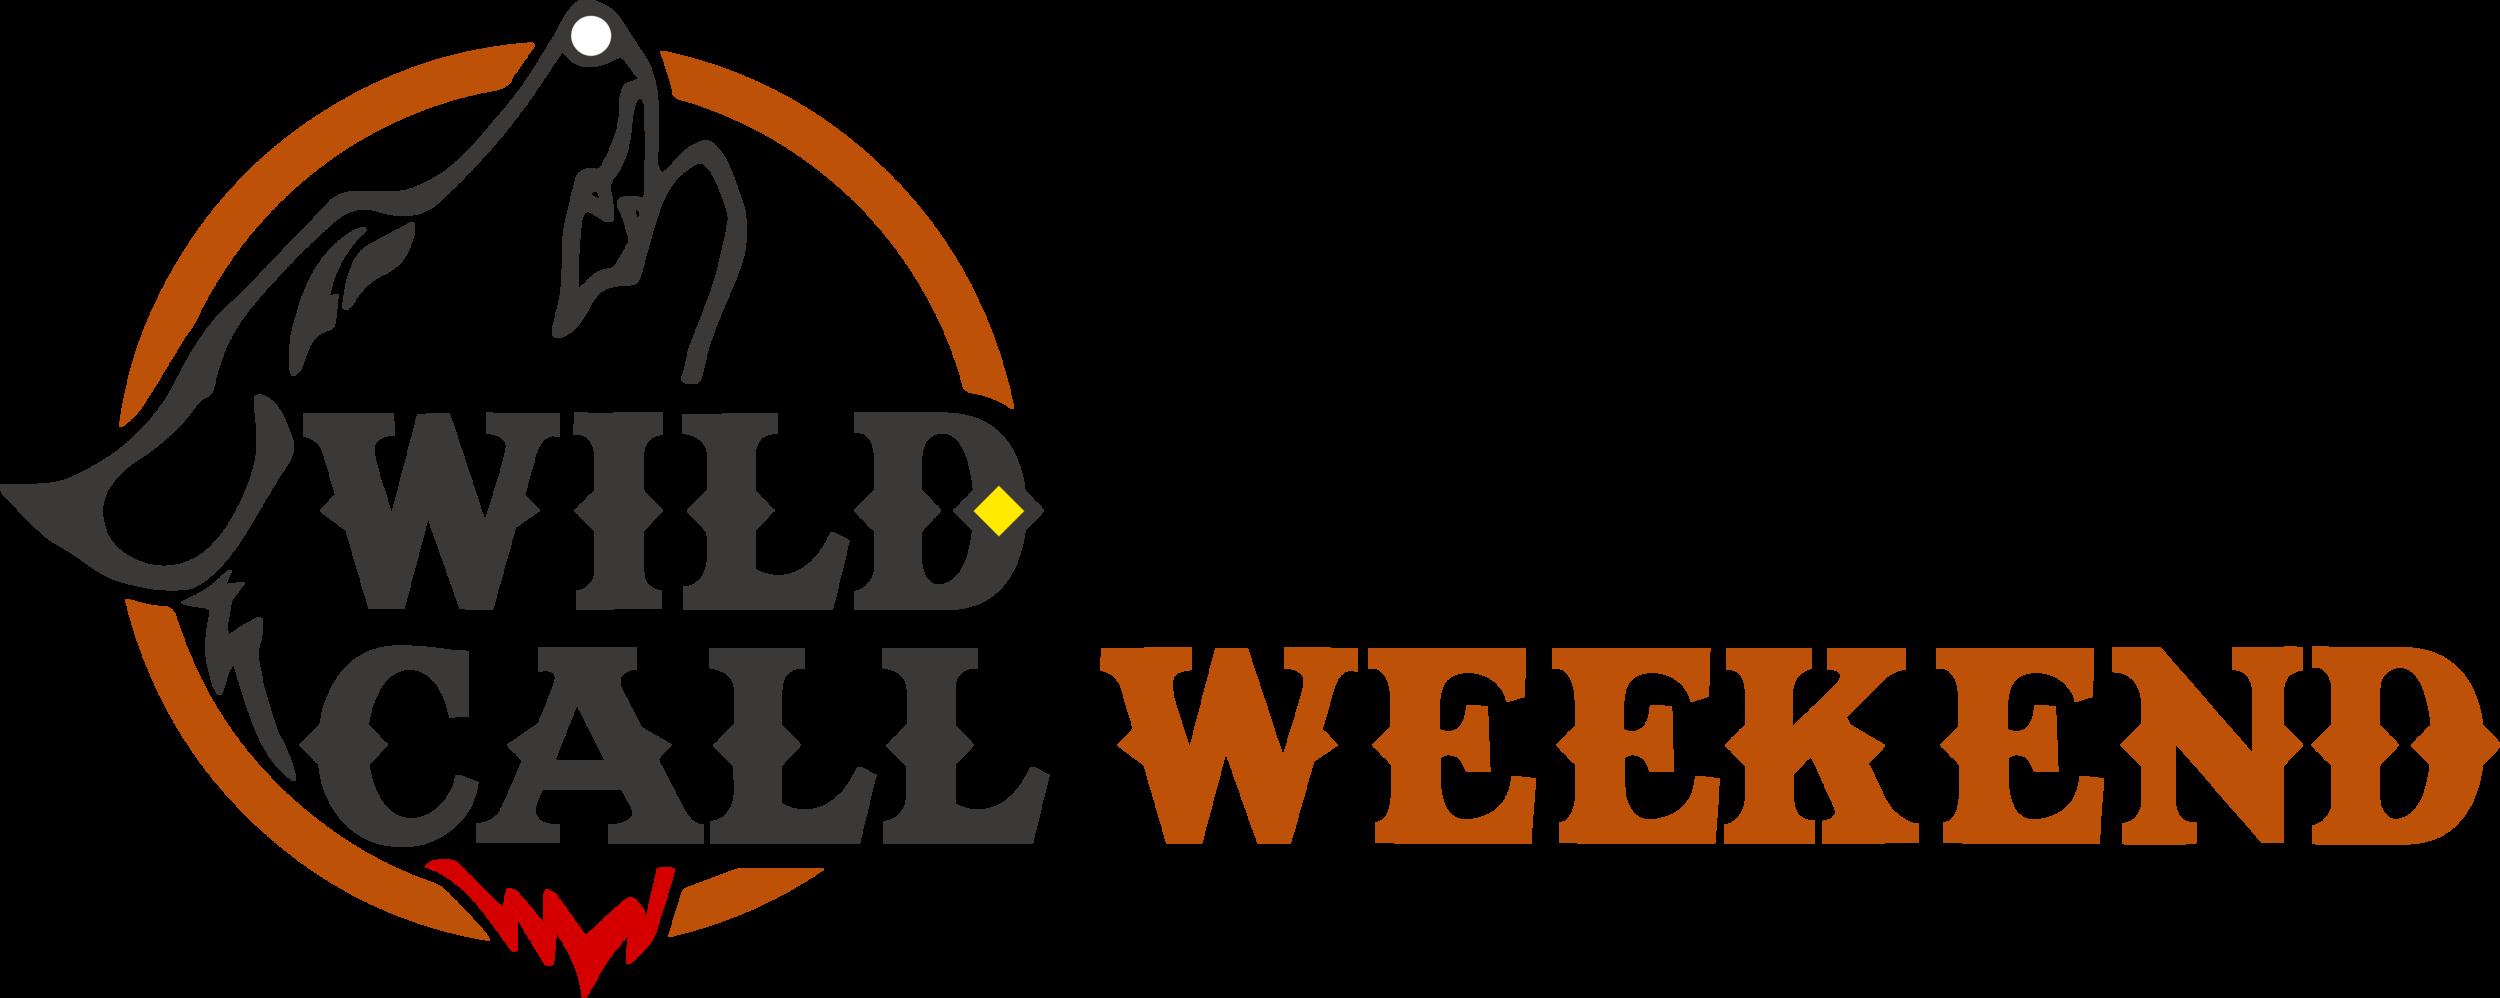 Wild Call Weekend, 2018